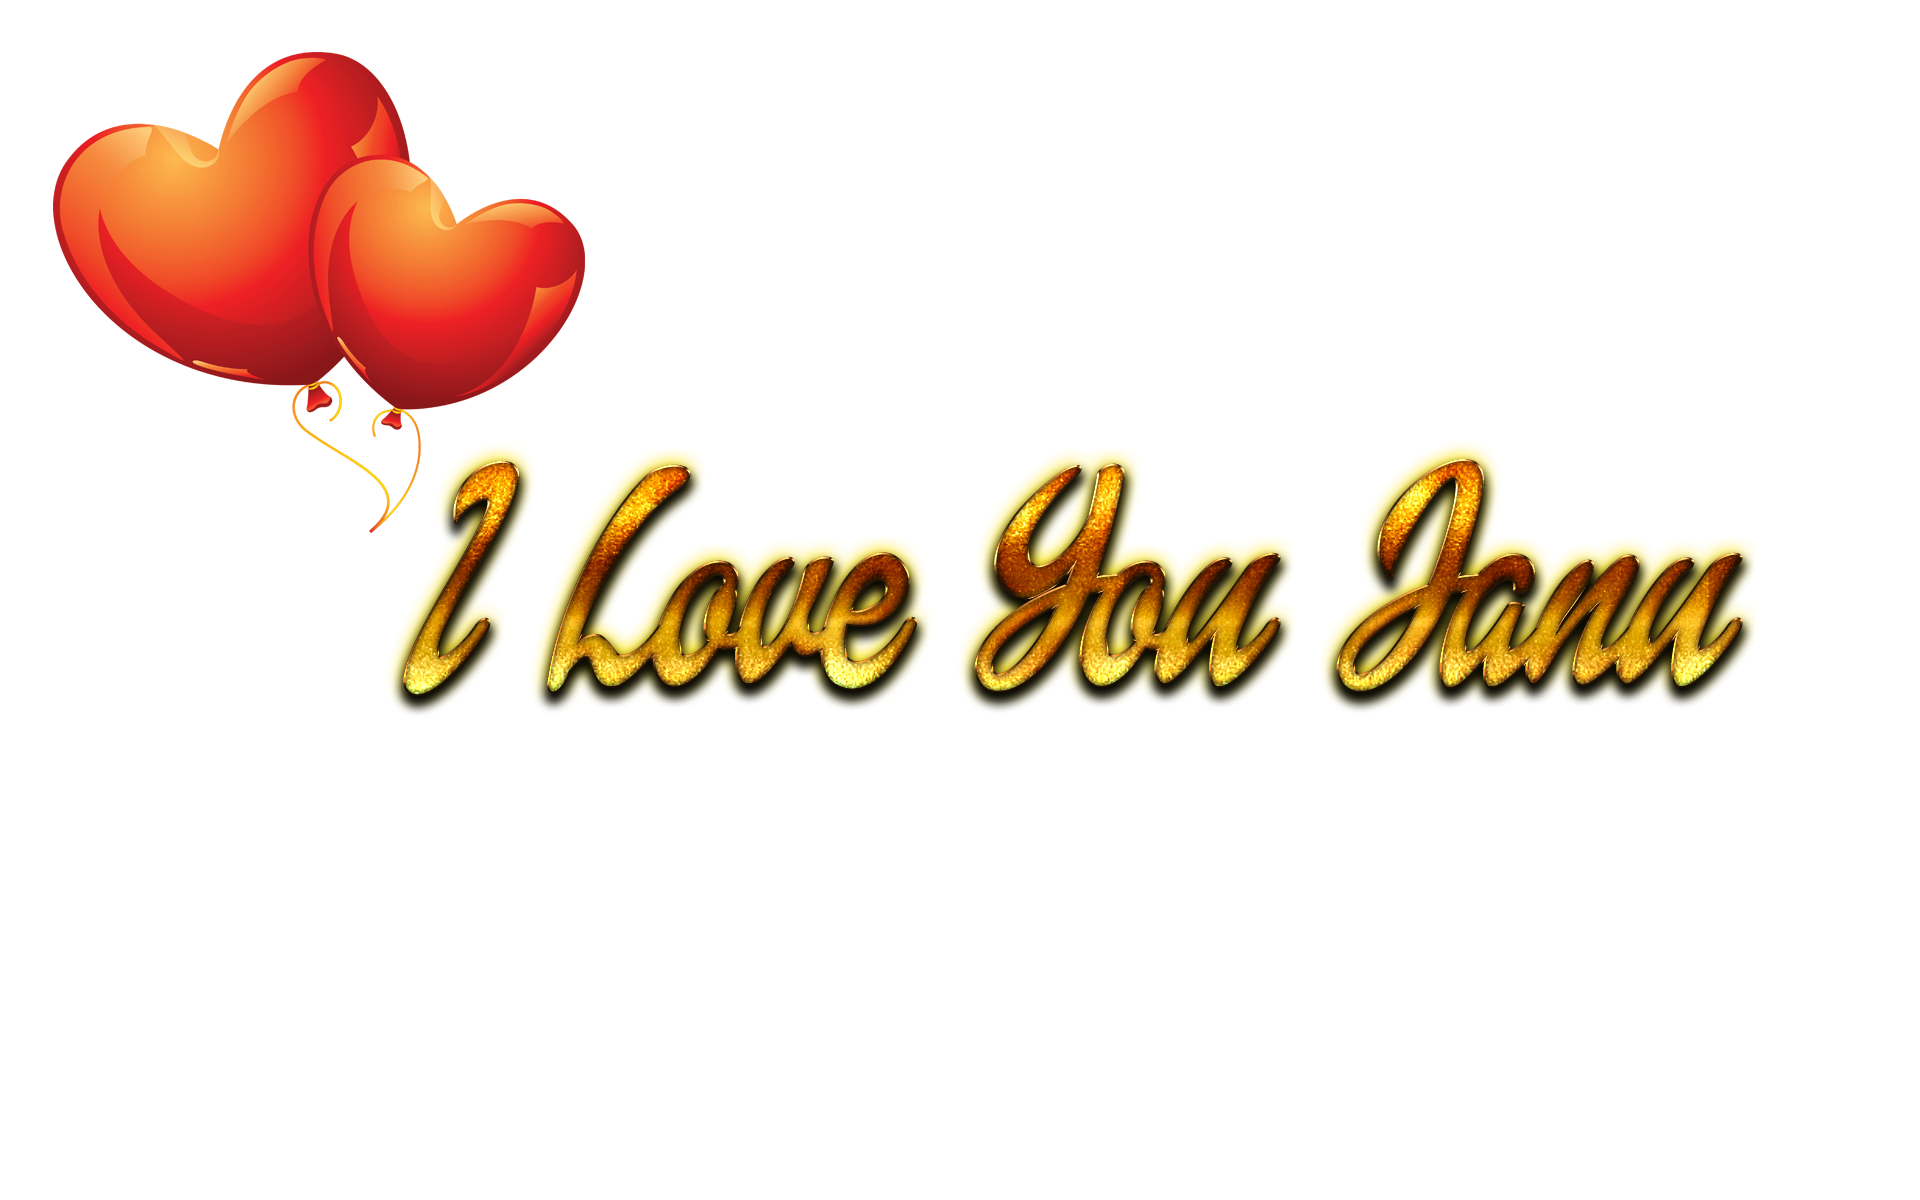 i love you janu name wallpaper shona name in design 679666 hd wallpaper backgrounds download i love you janu name wallpaper shona